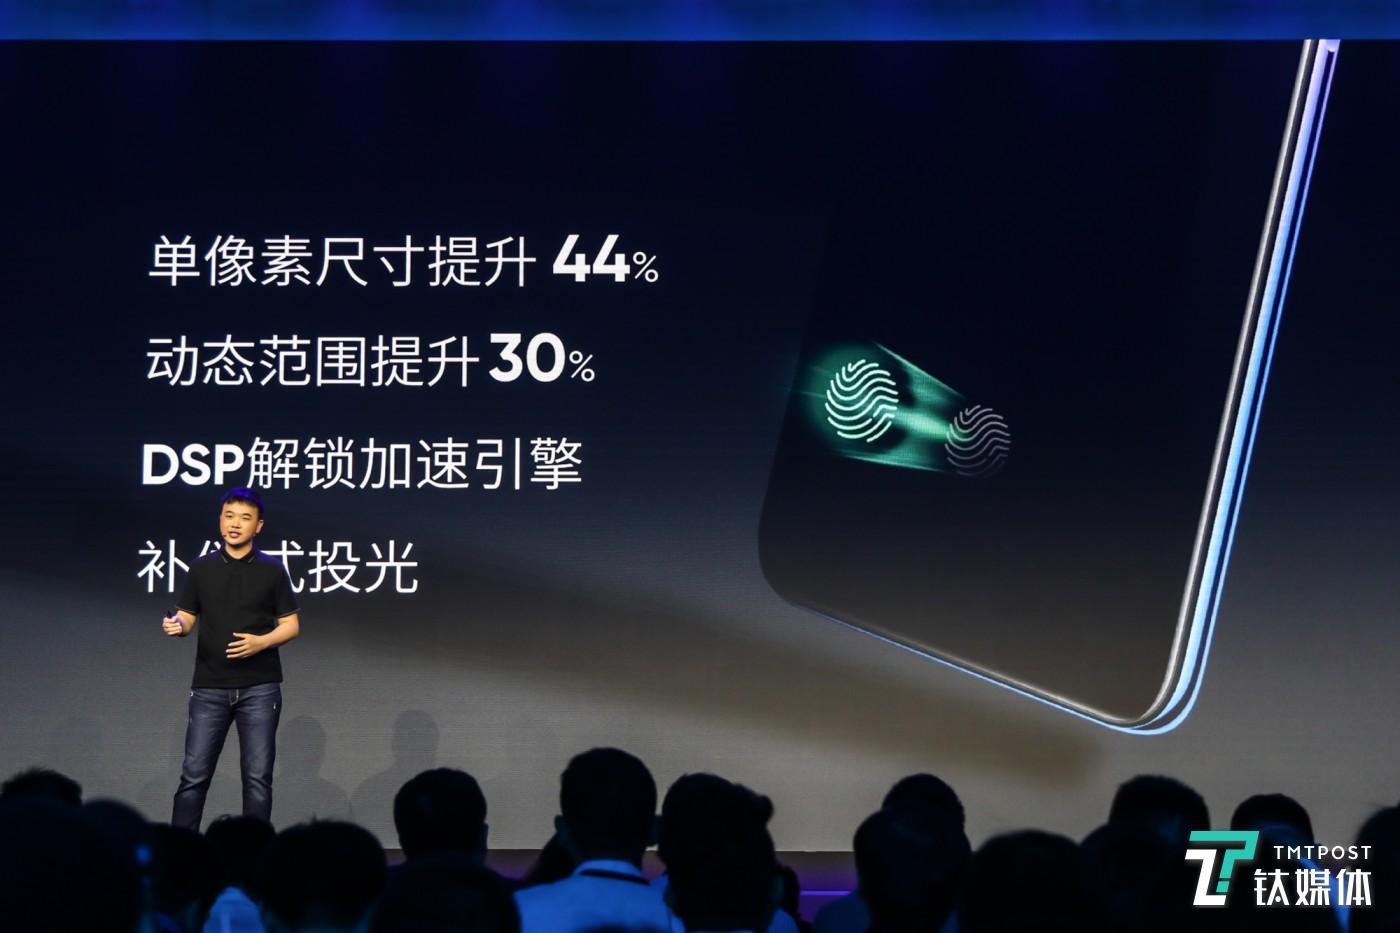 Realme X with off-screen fingerprint unlock